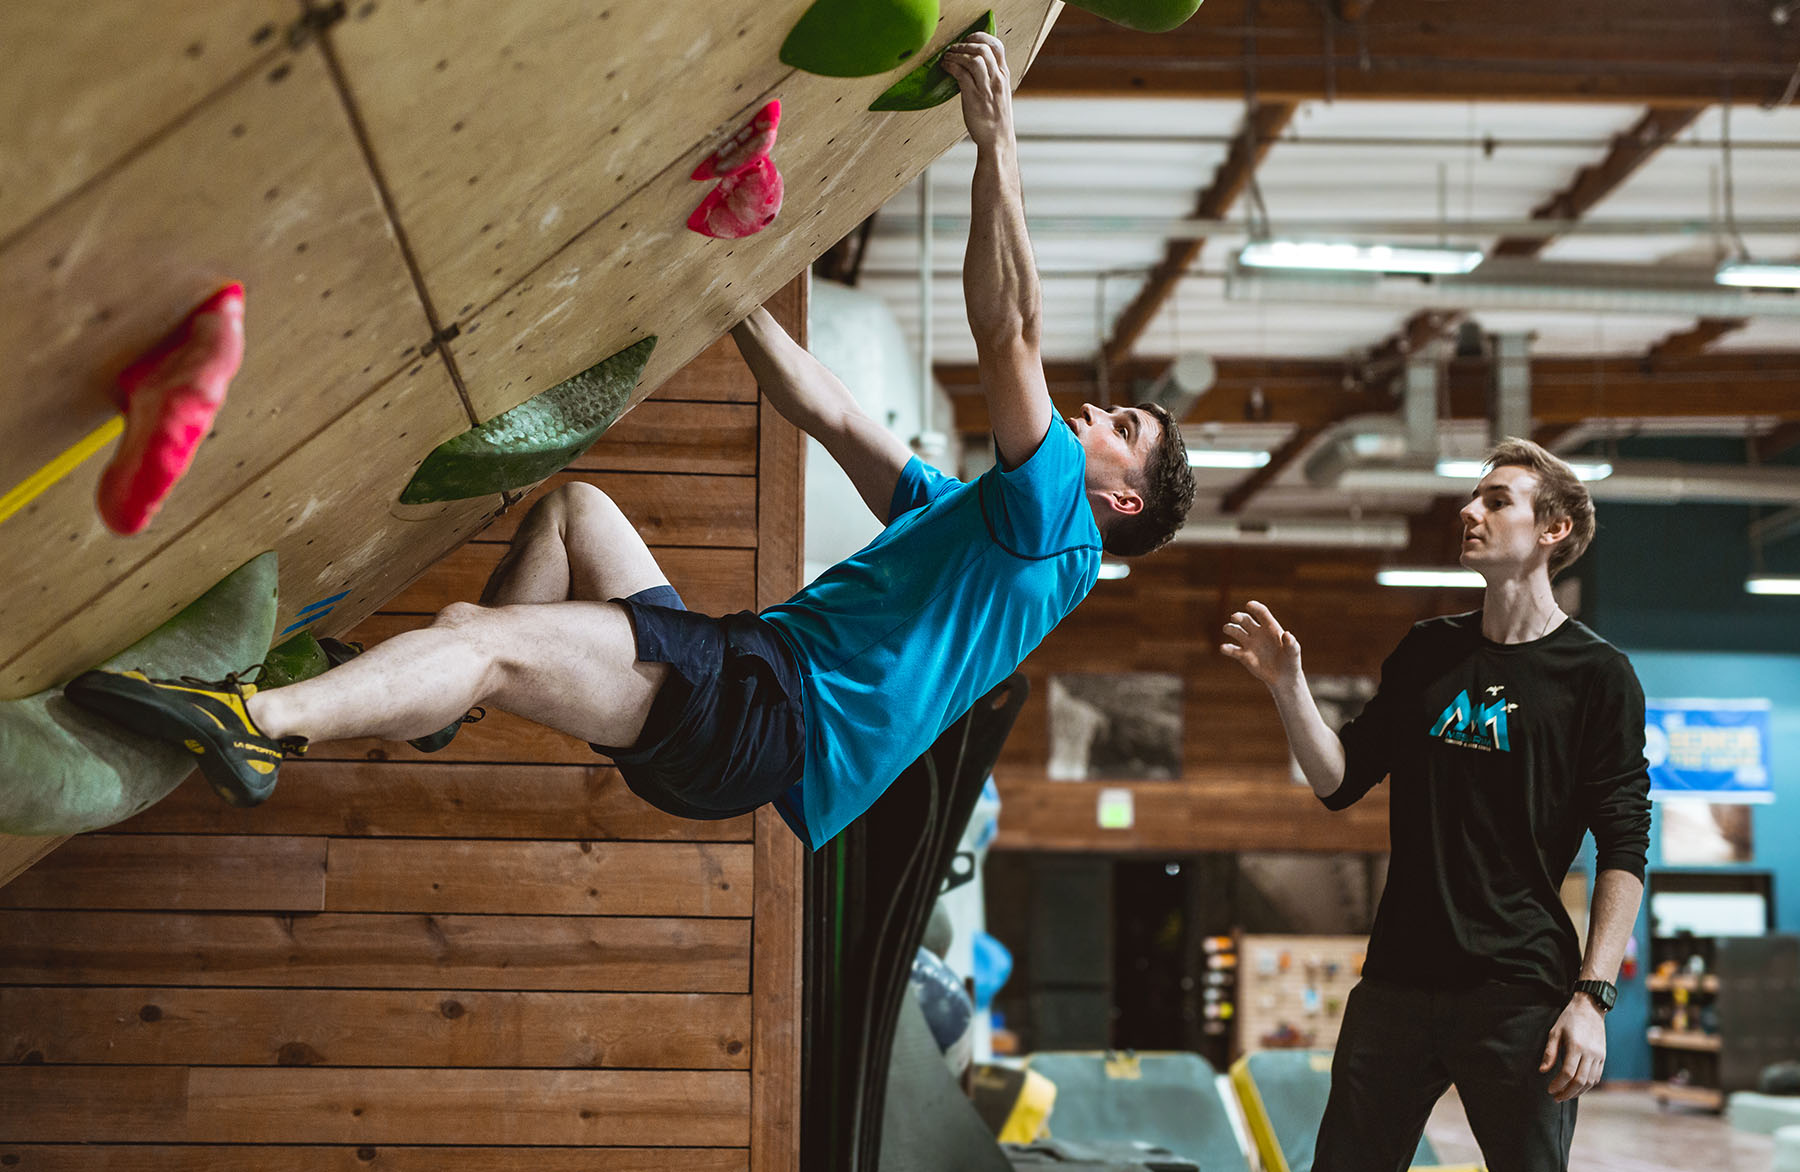 Adult Climbing Team